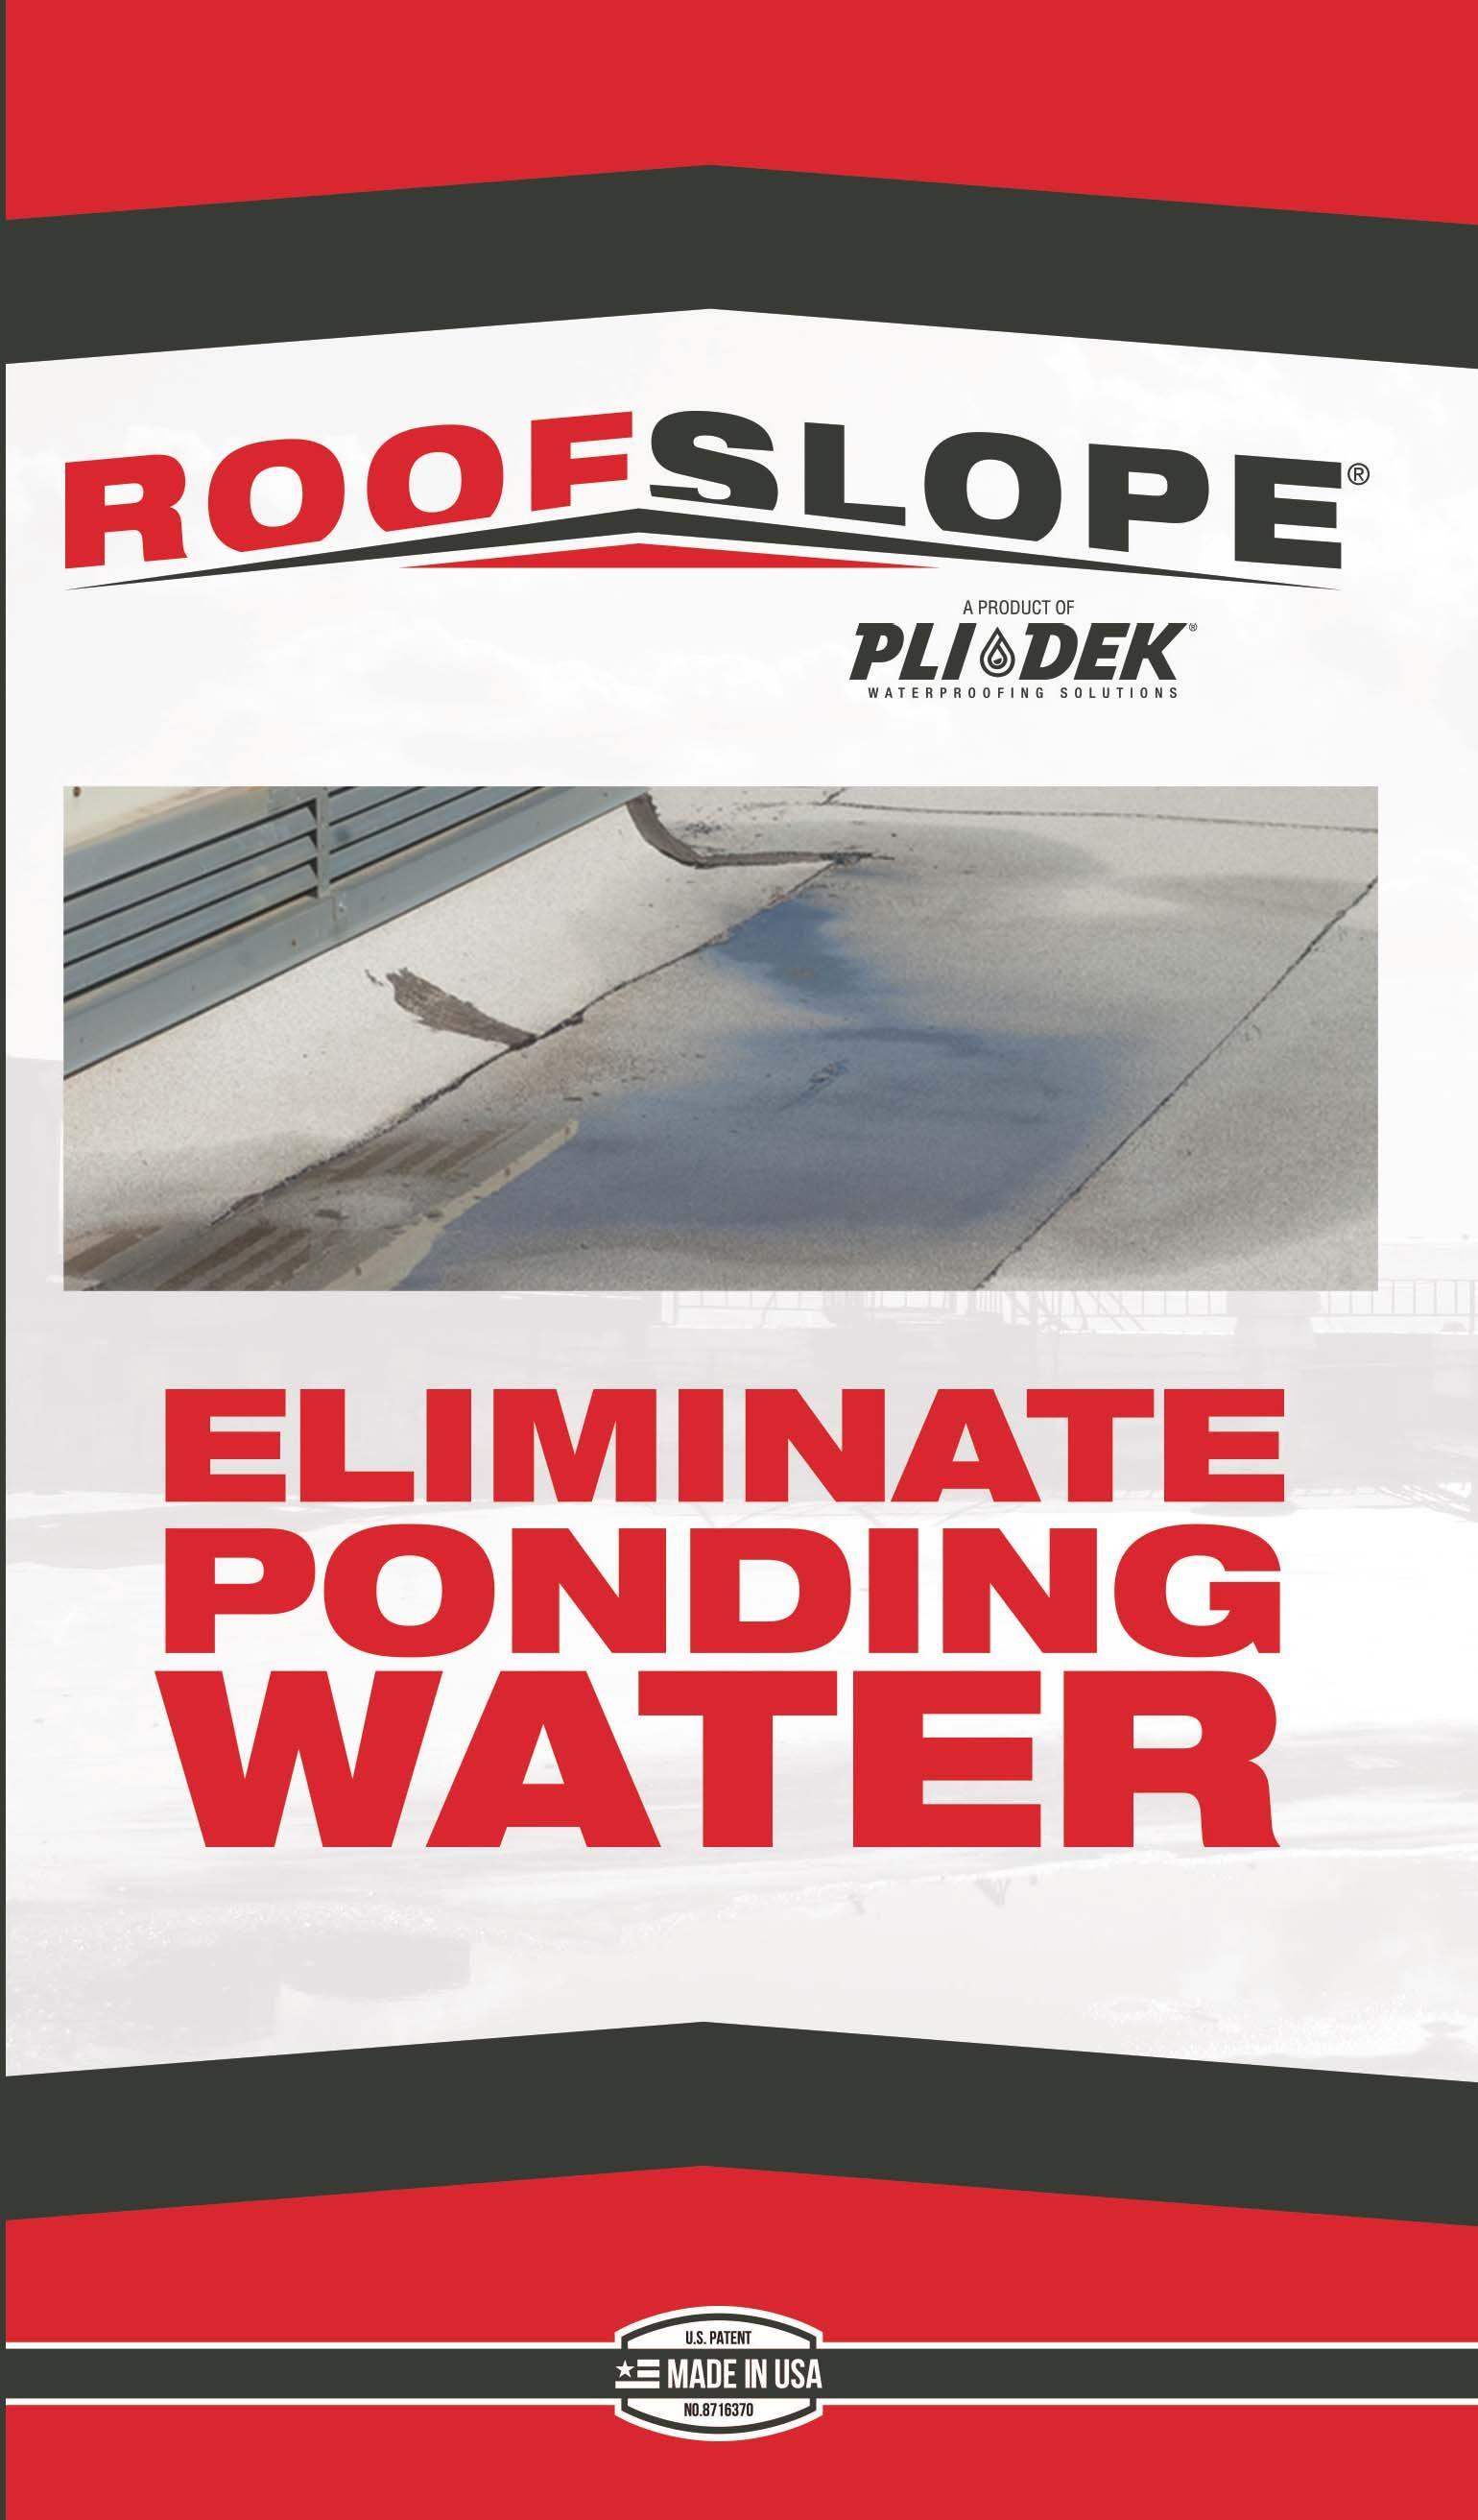 Eliminate Ponding Water Pondingwater Roofslope Flatroofs Flatcommercialroofs Ponding Puddles Plidek Roofing Diy Roof S Roof